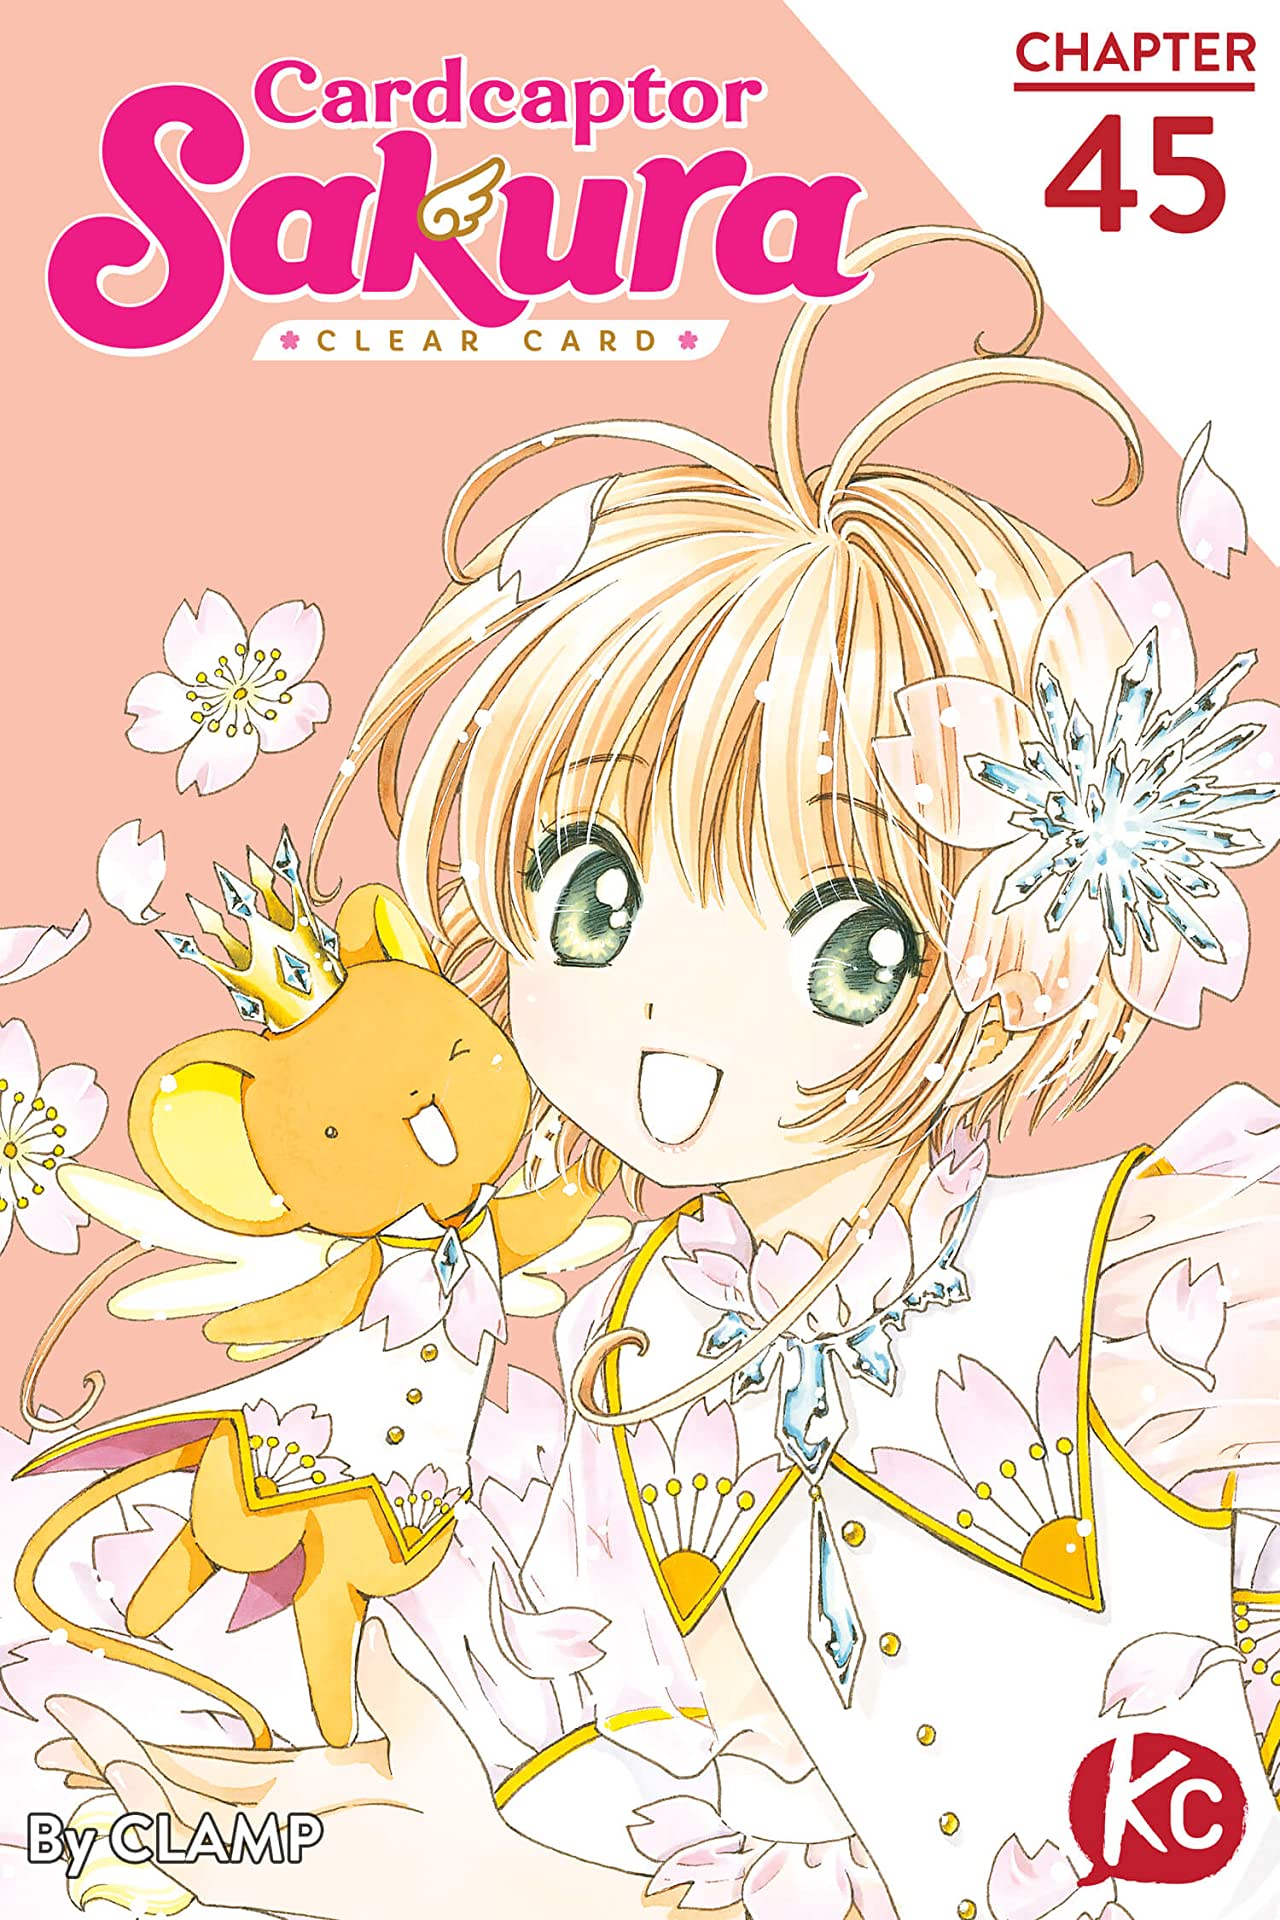 Cardcaptor Sakura: Clear Card No.45